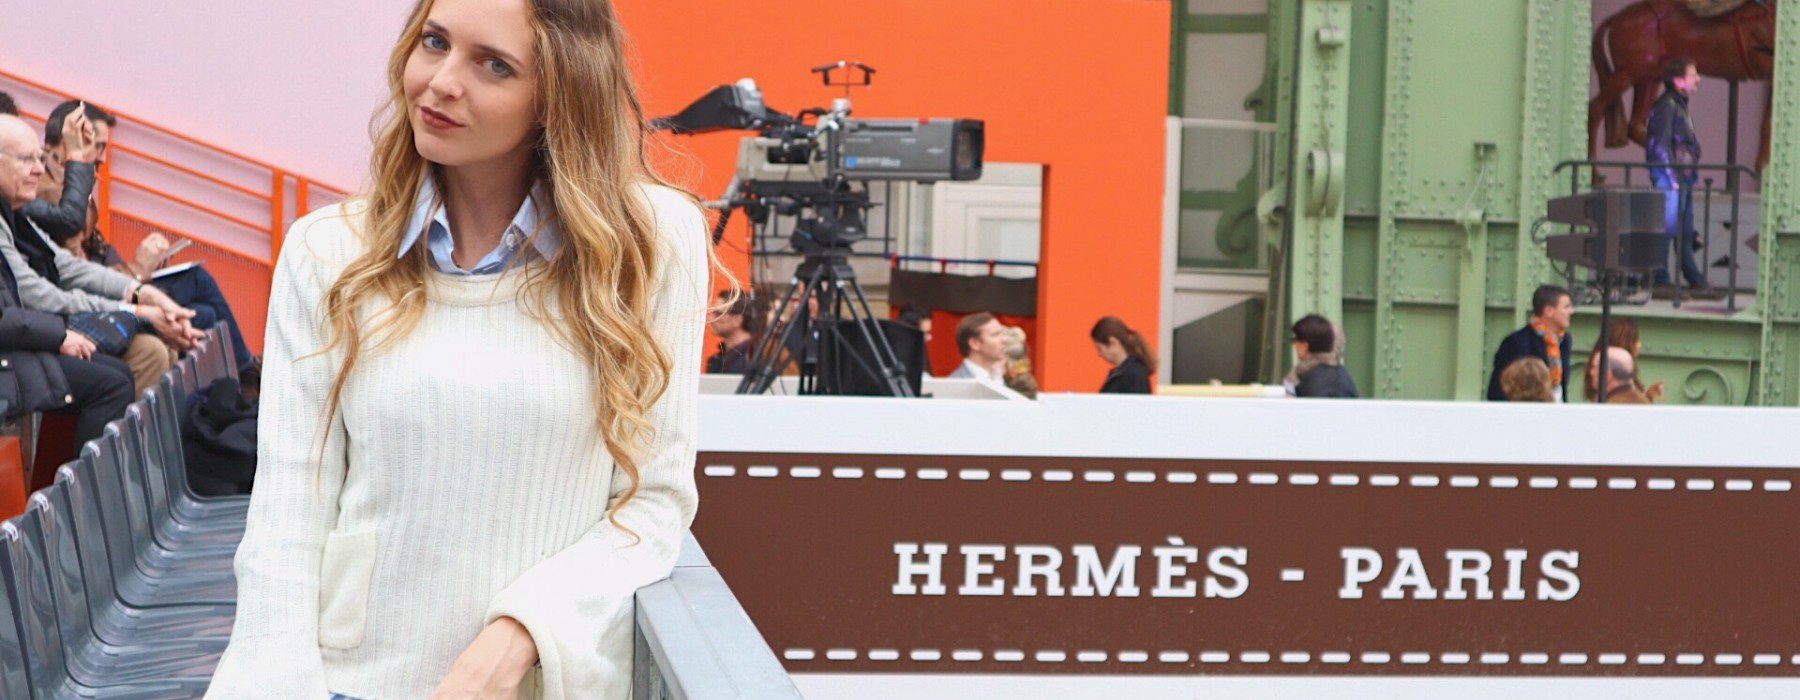 Saut Hermès 2017: Prima Edwina Tops-Alexander